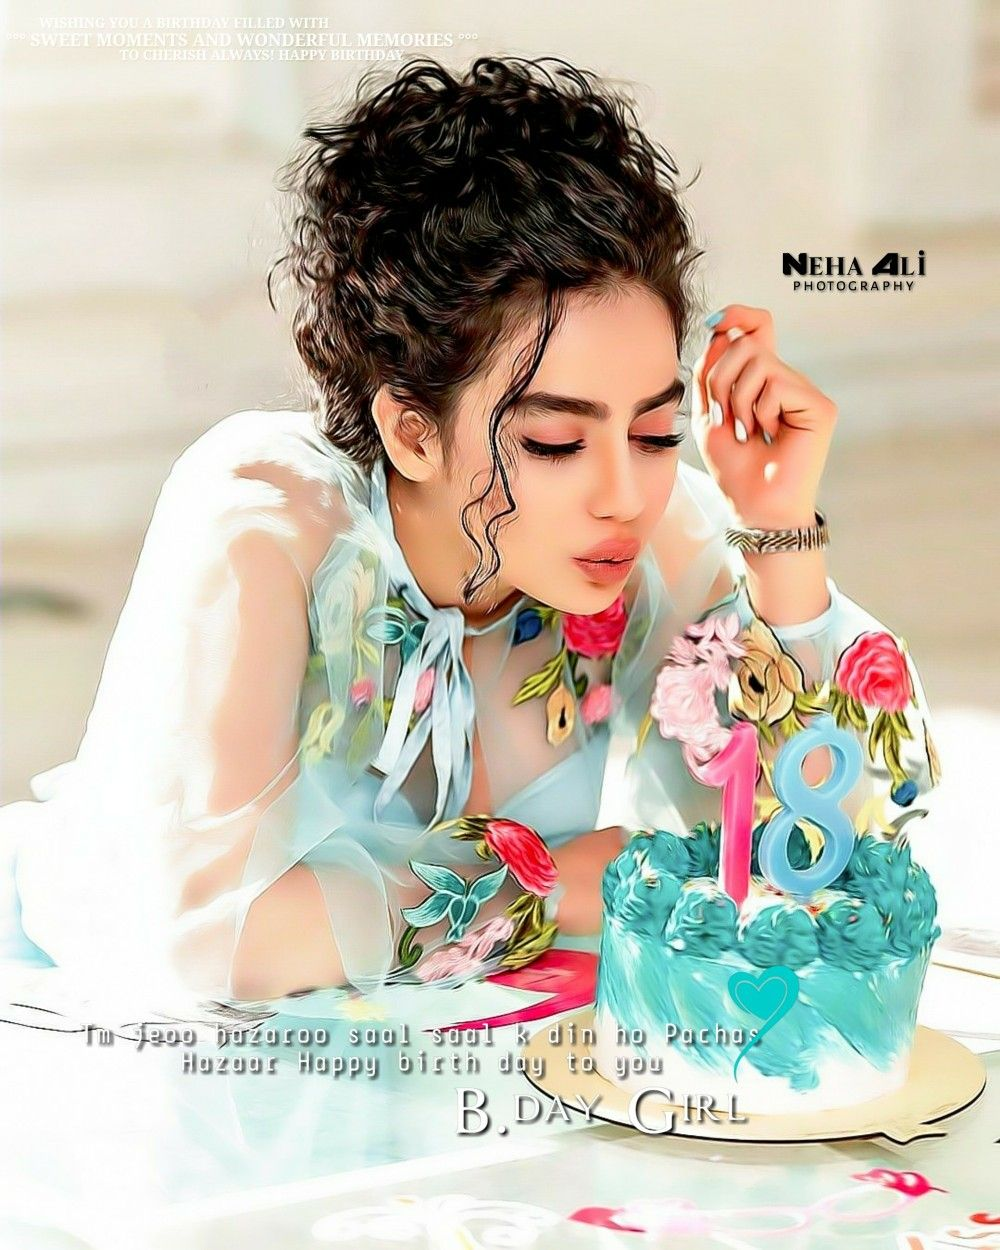 Pin By Neha Ali On My Creations Happy Birthday Girls Bday Girl Girl Birthday